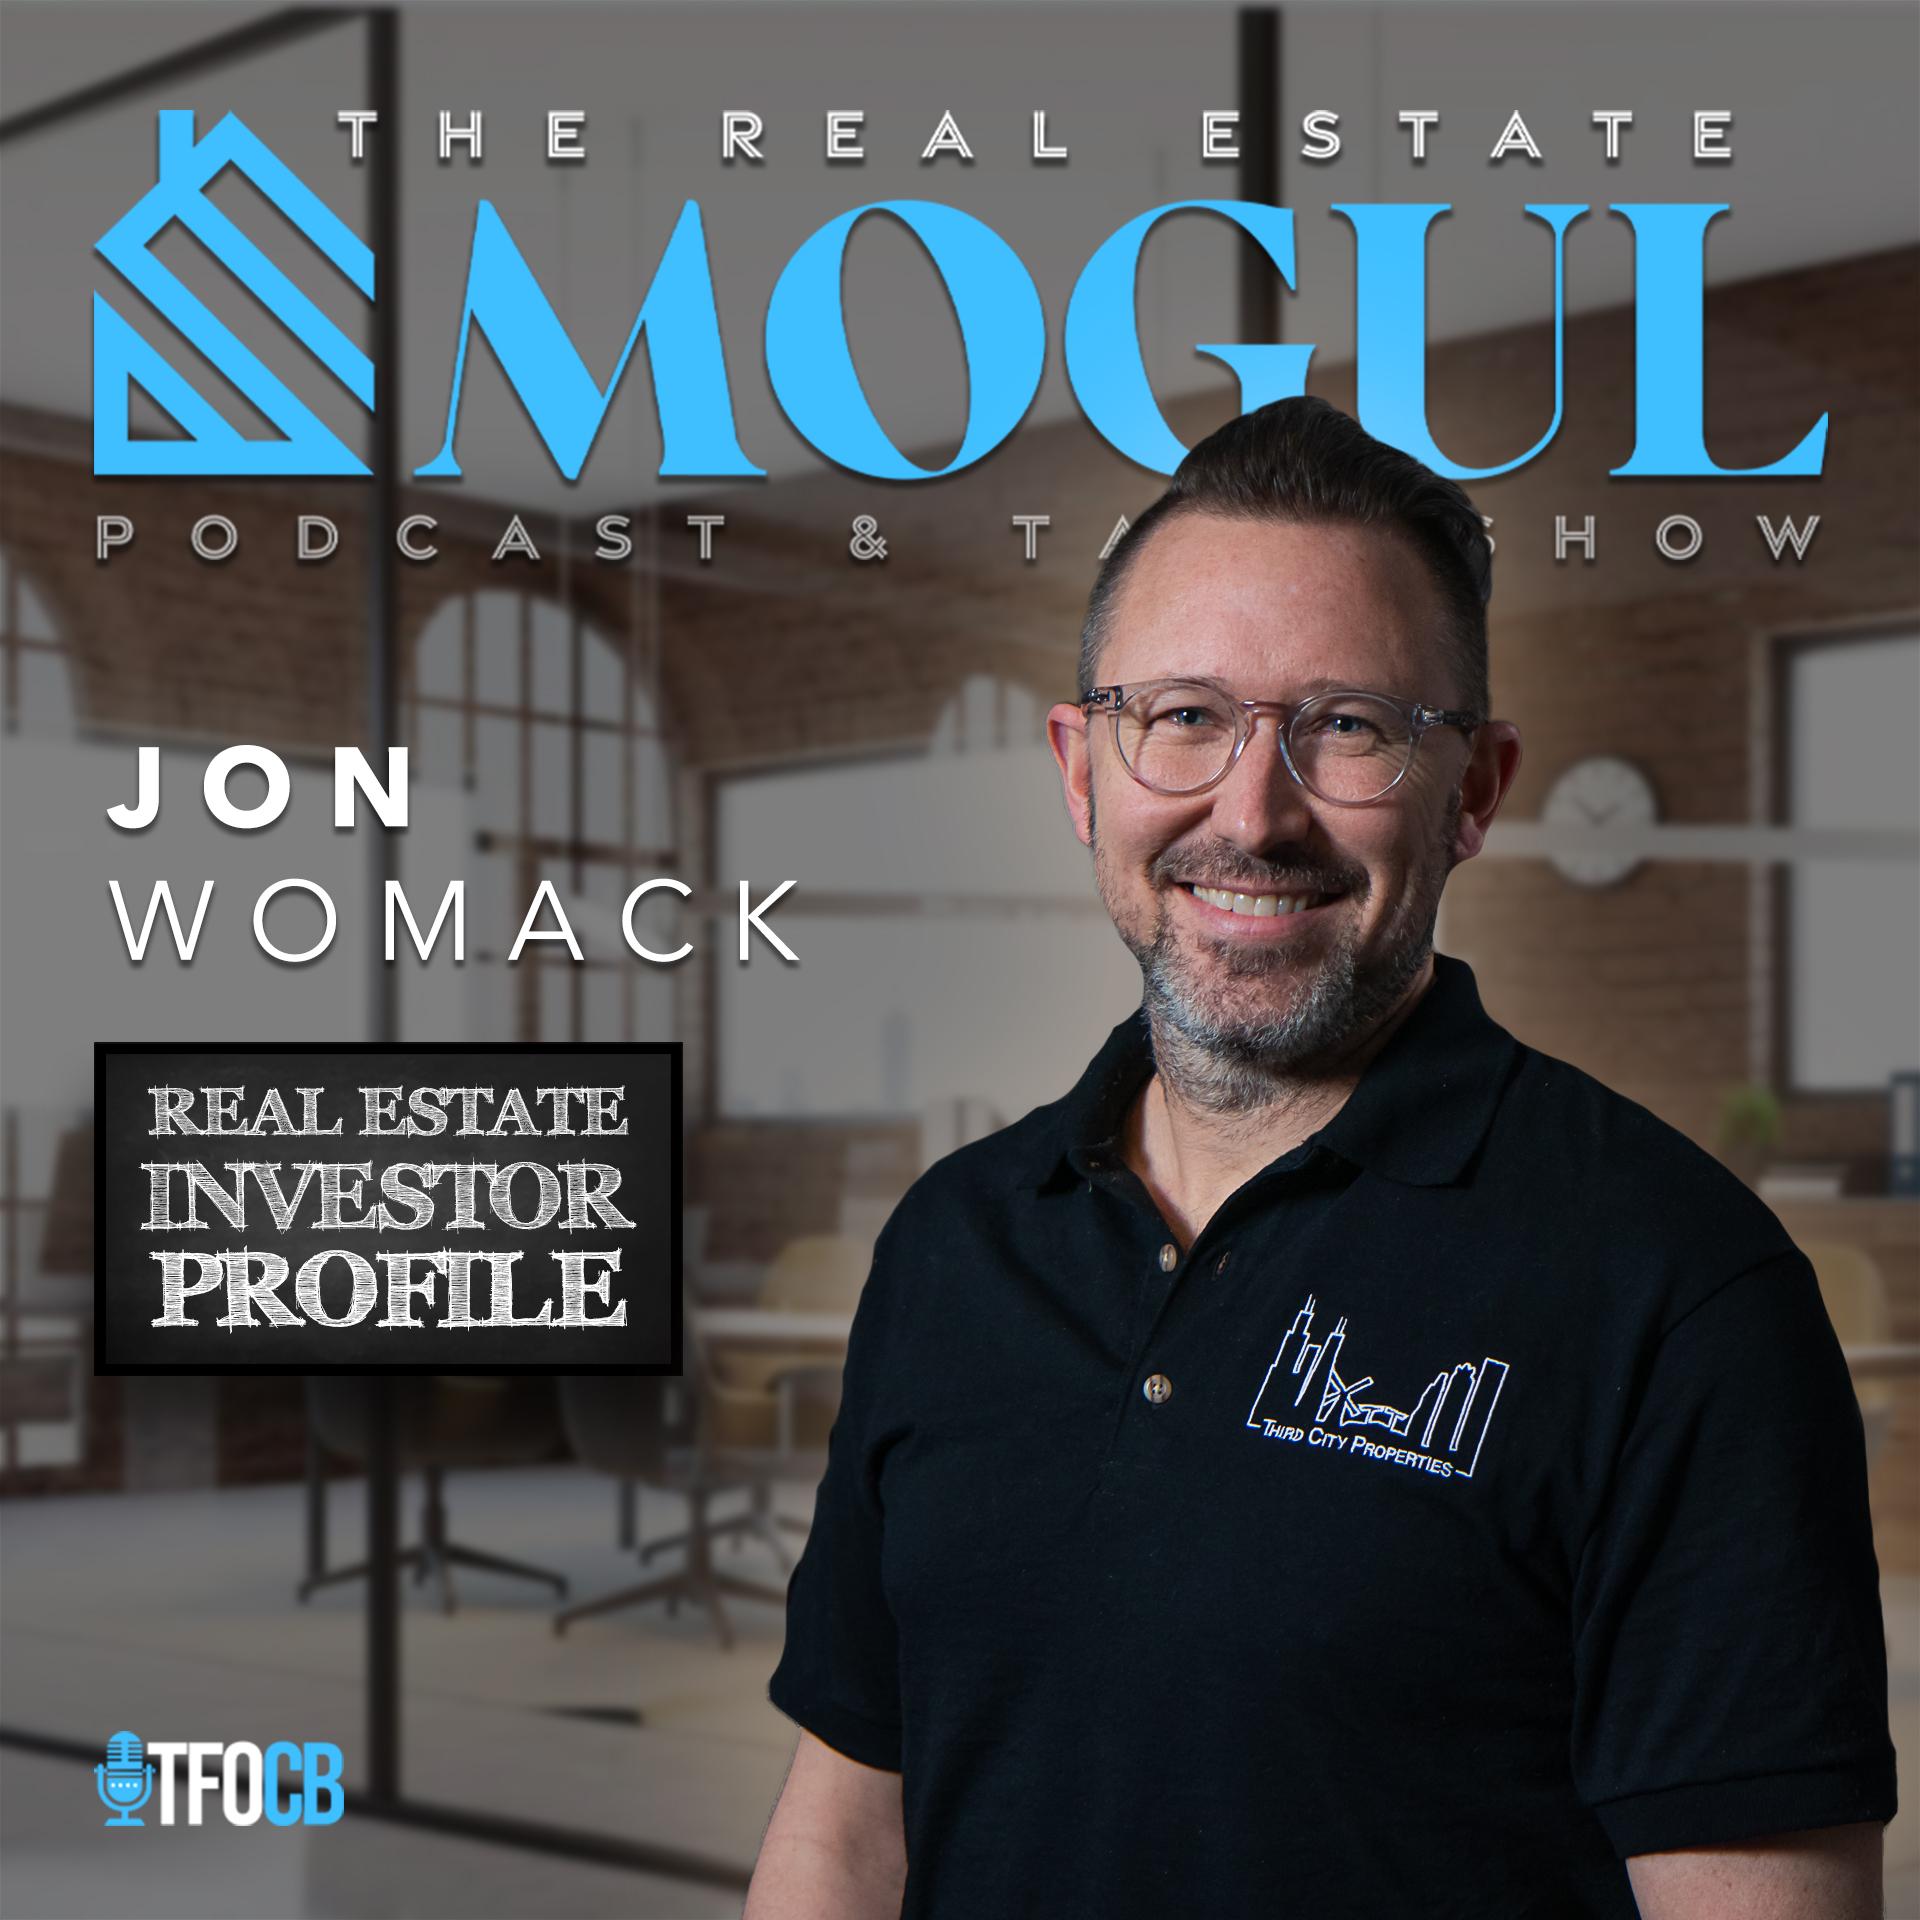 Artwork for podcast Real Estate Moguls